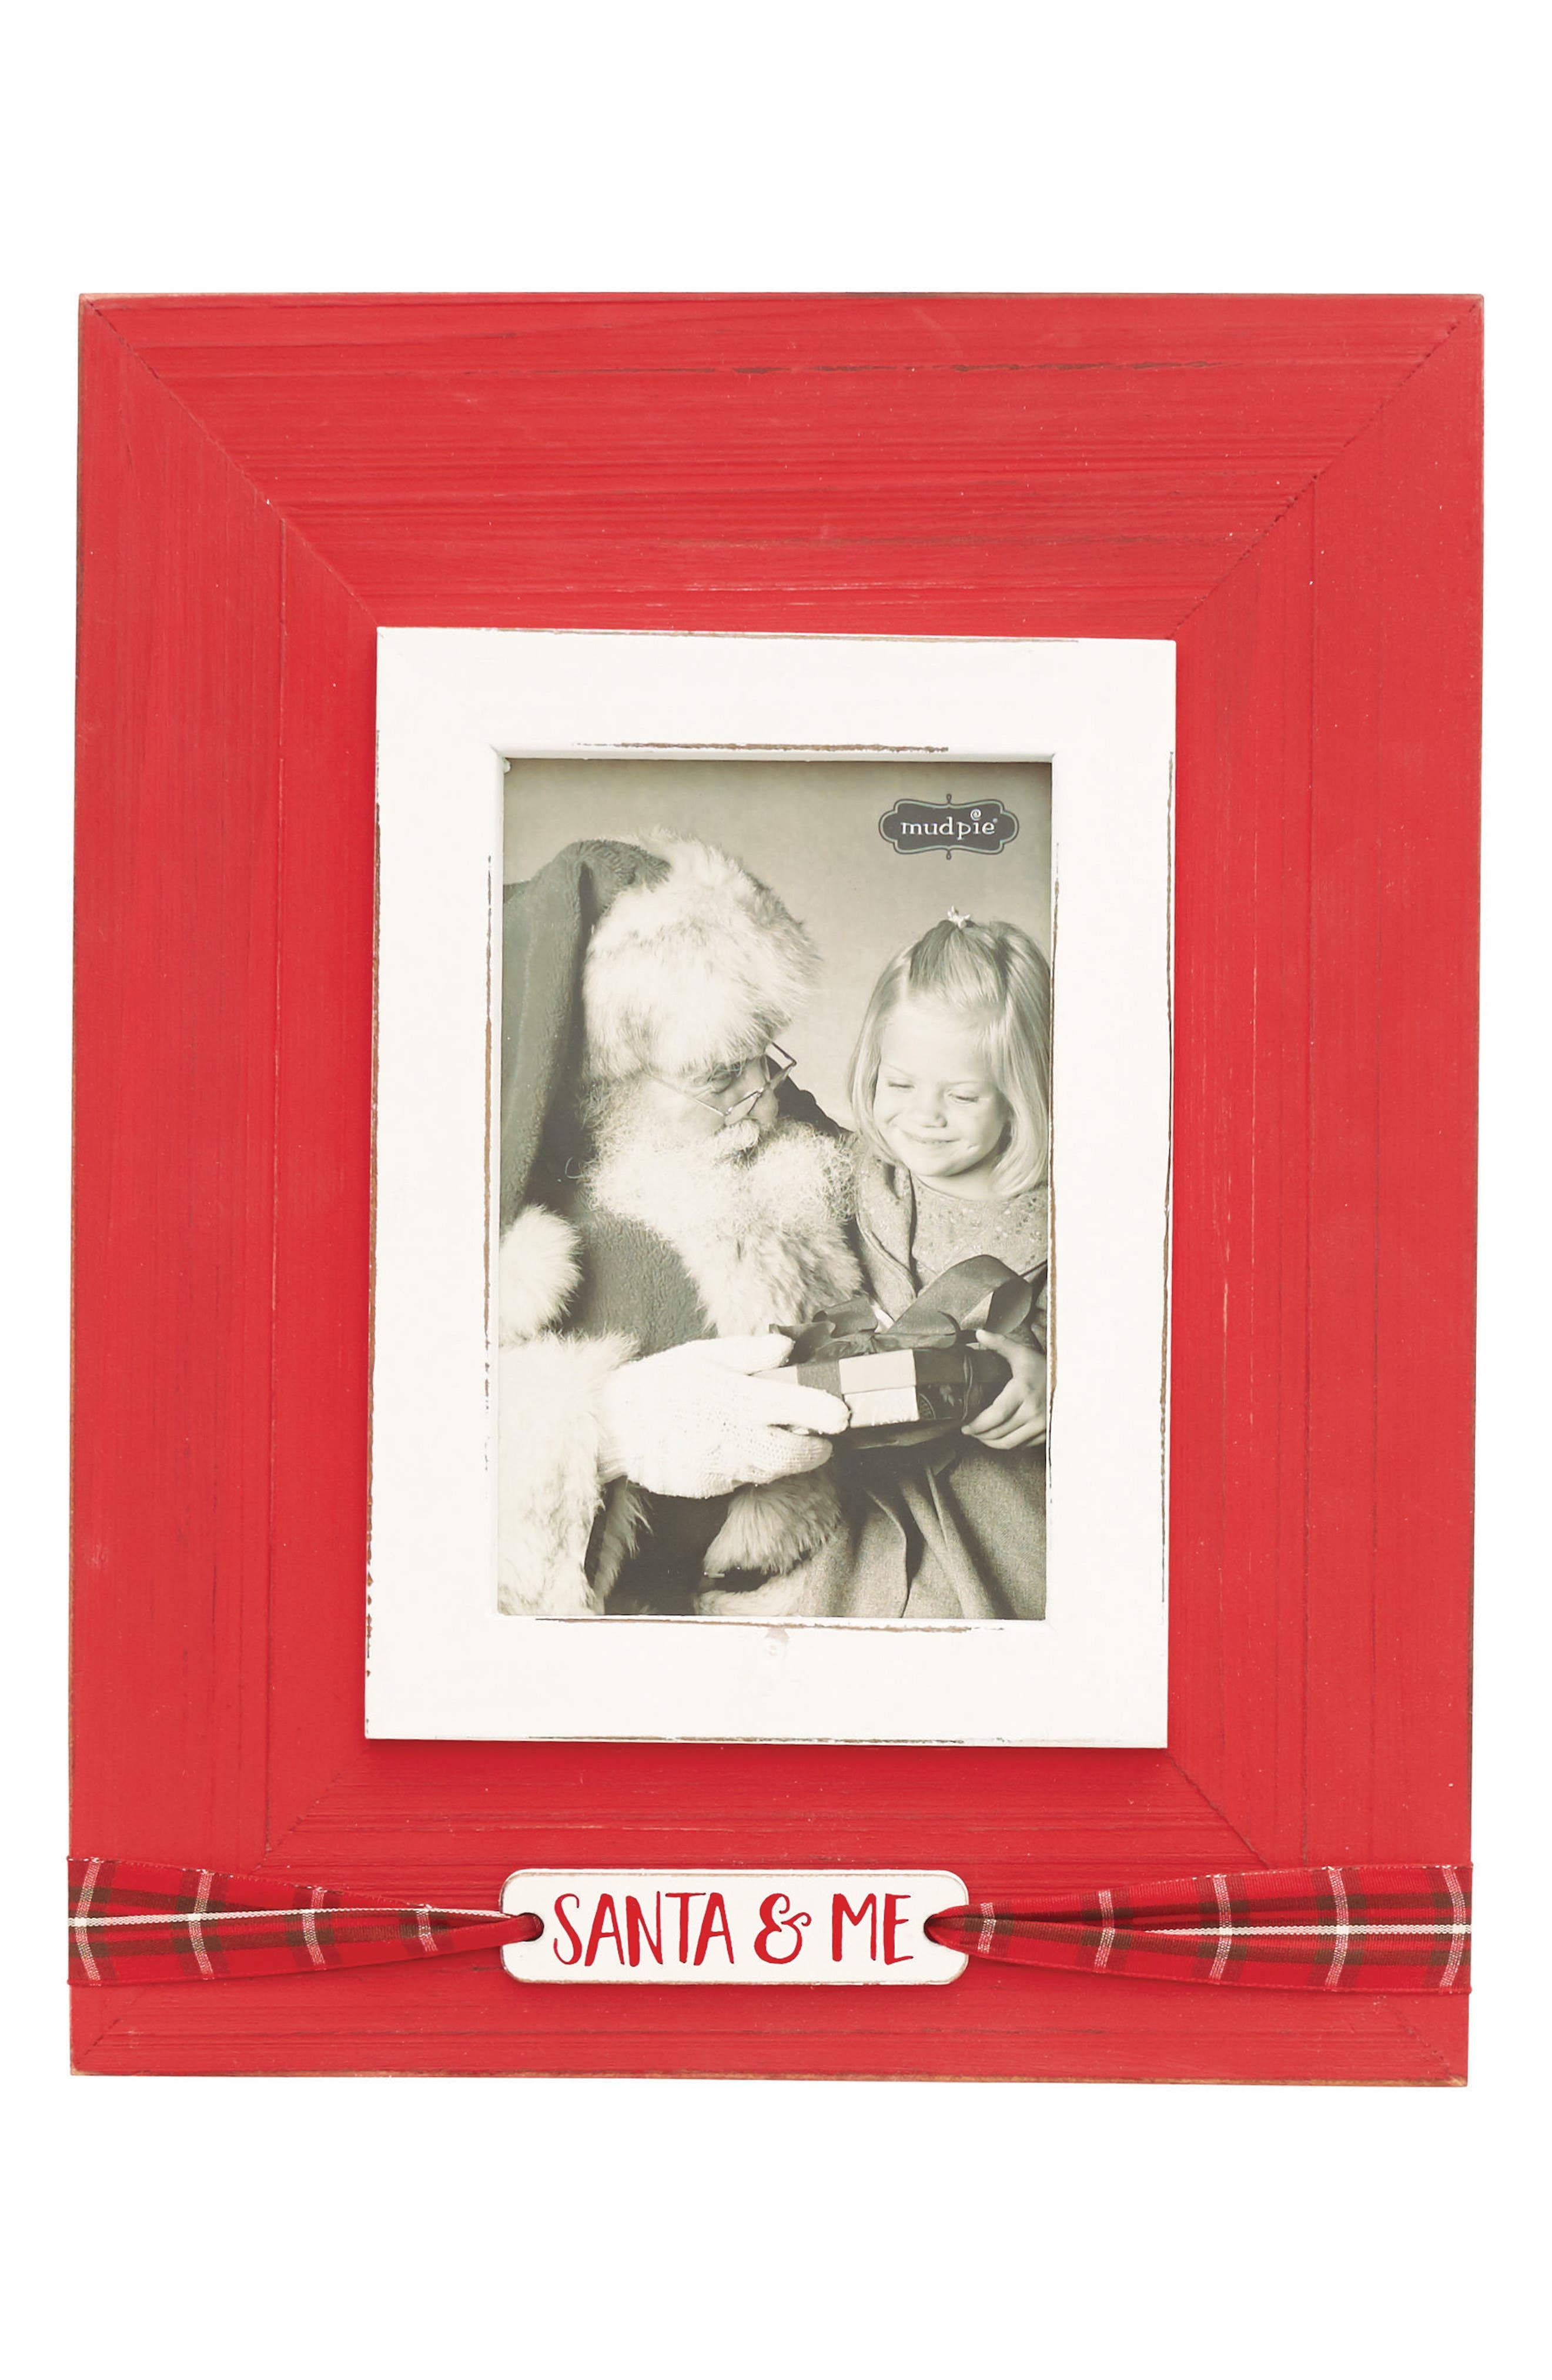 Santa & Me Tartan Ribbon Wood Photo Frame,                             Main thumbnail 1, color,                             600